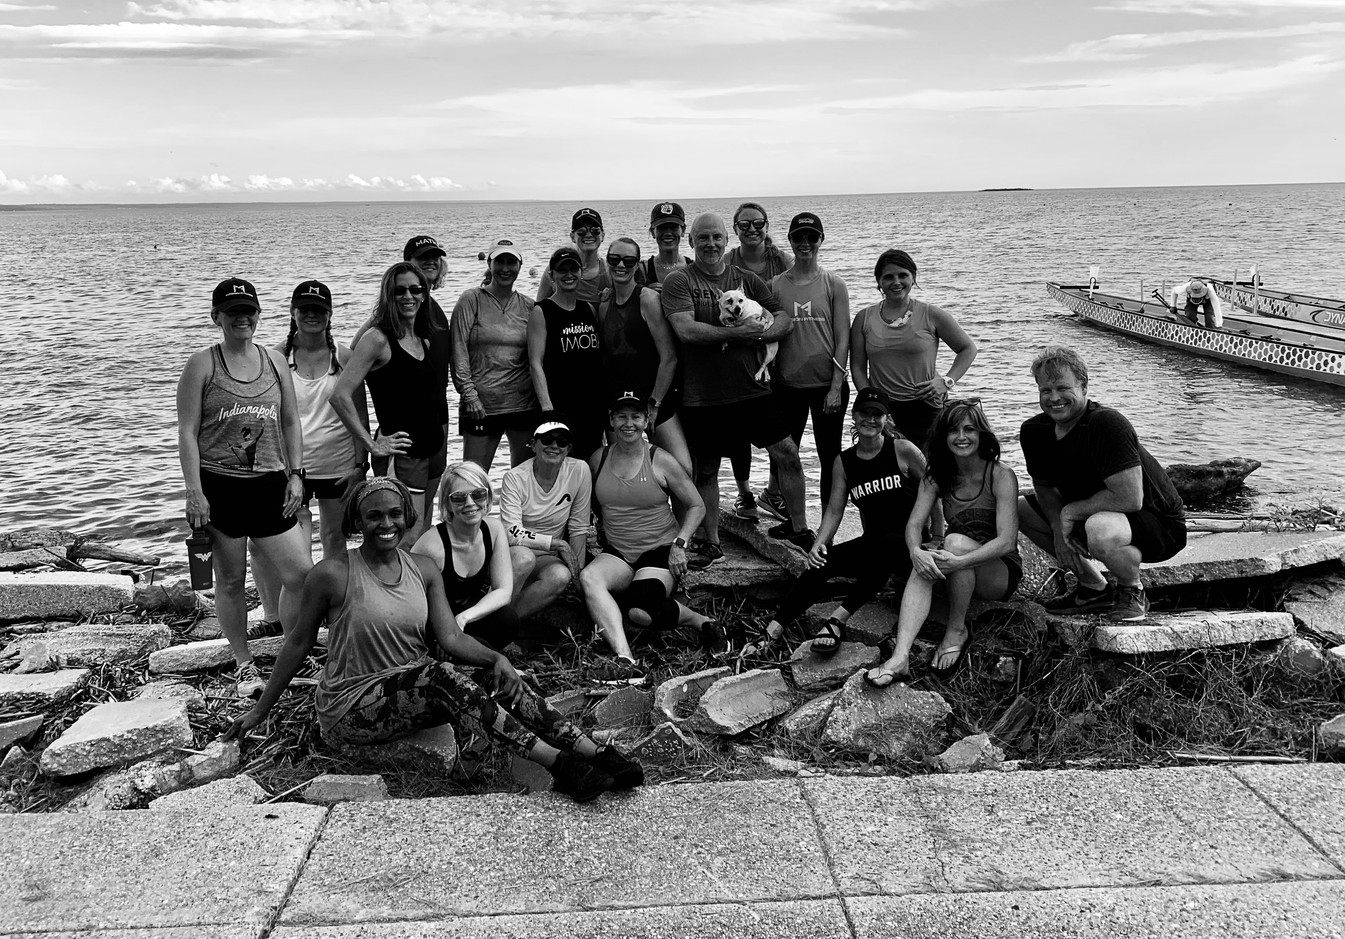 Mission [MOB] Dragon Boat Team 2019